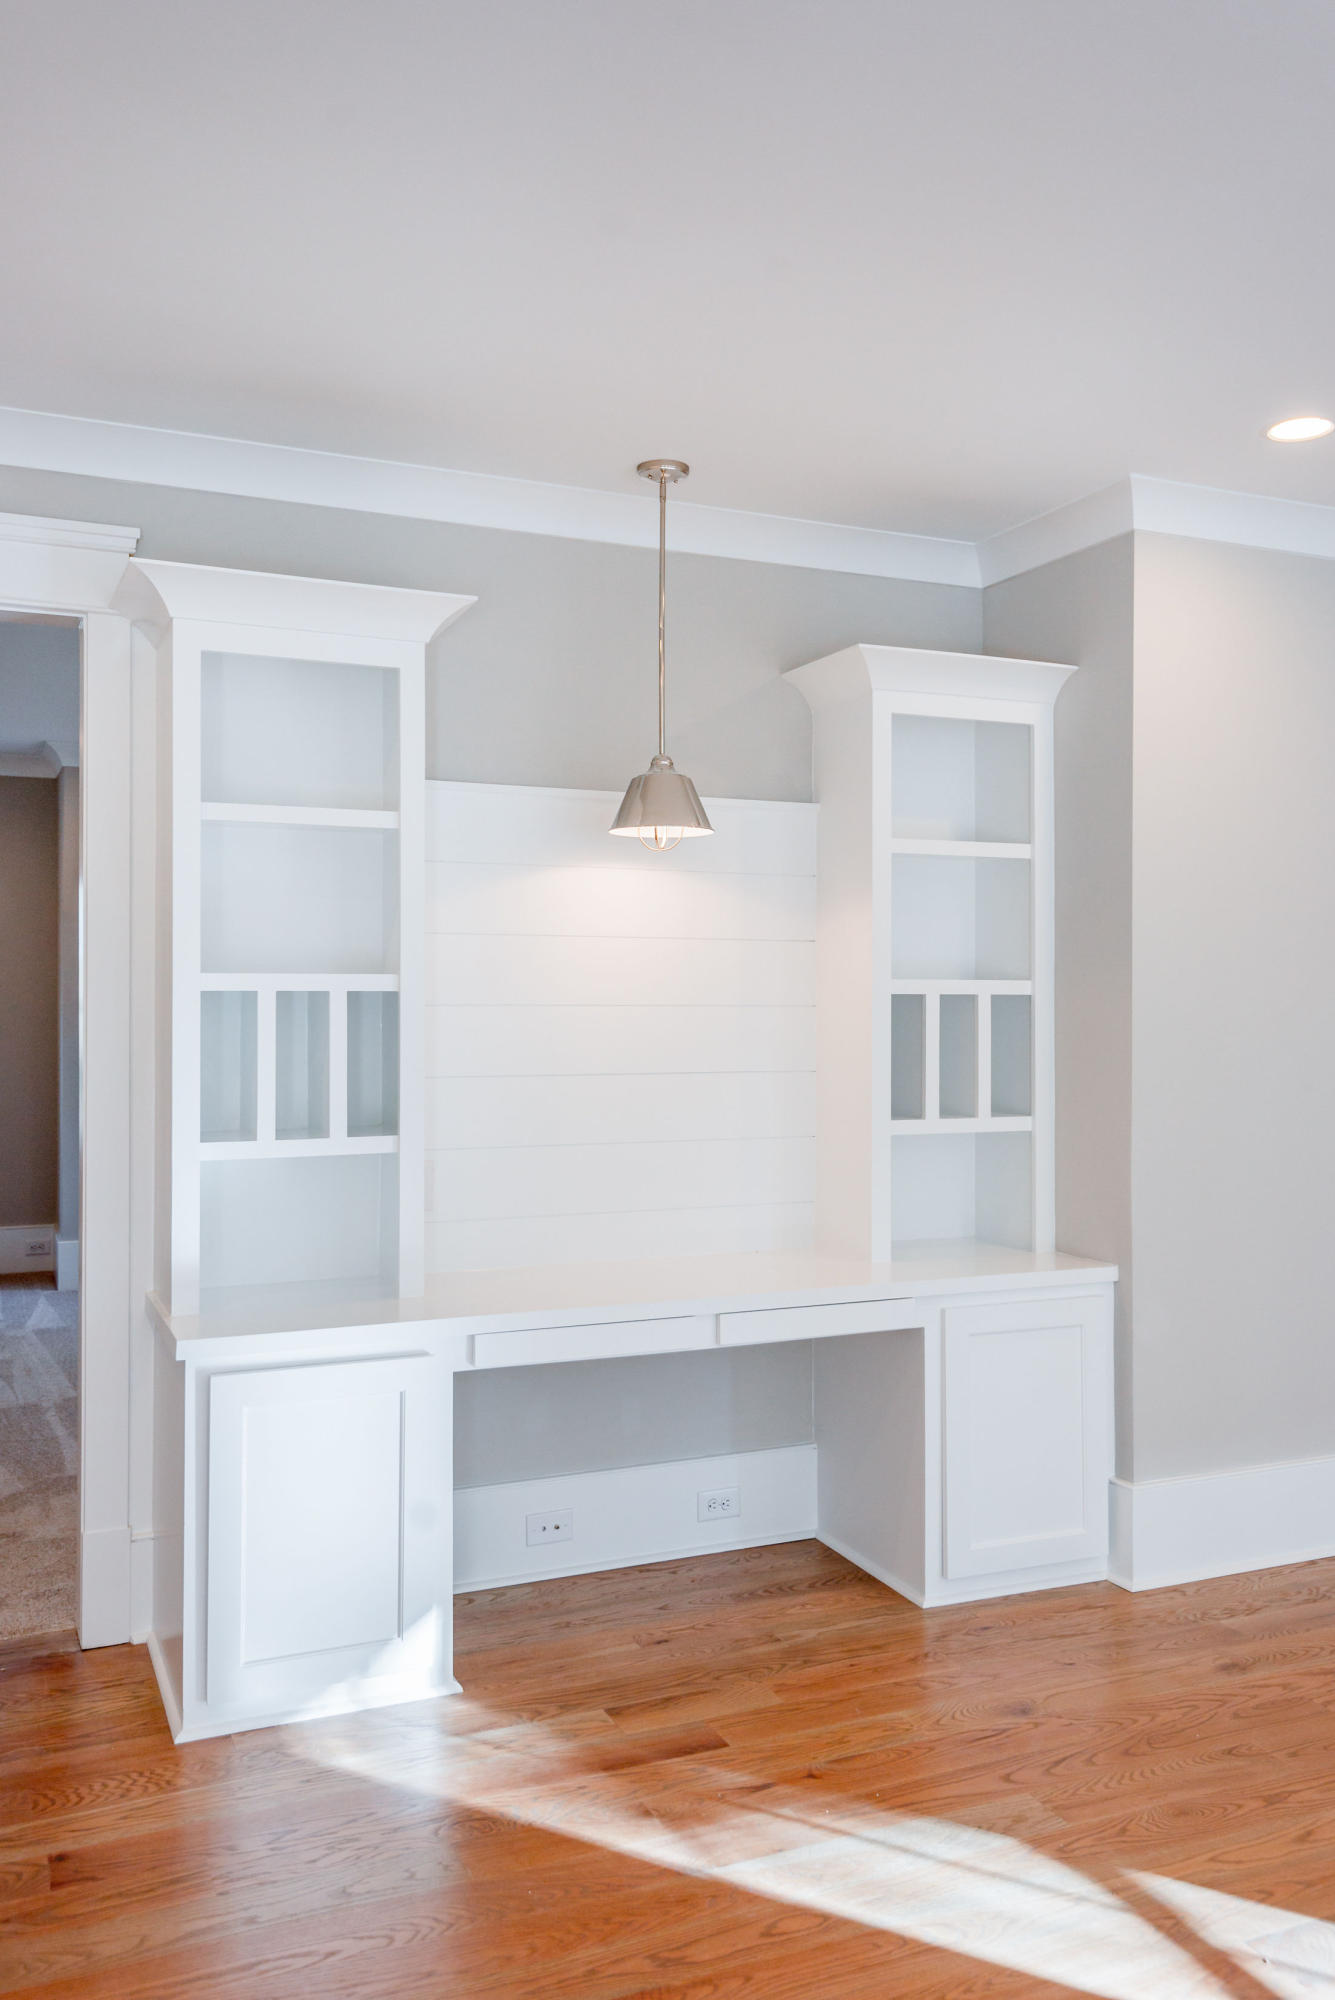 Park West Homes For Sale - 2295 Middlesex, Mount Pleasant, SC - 14